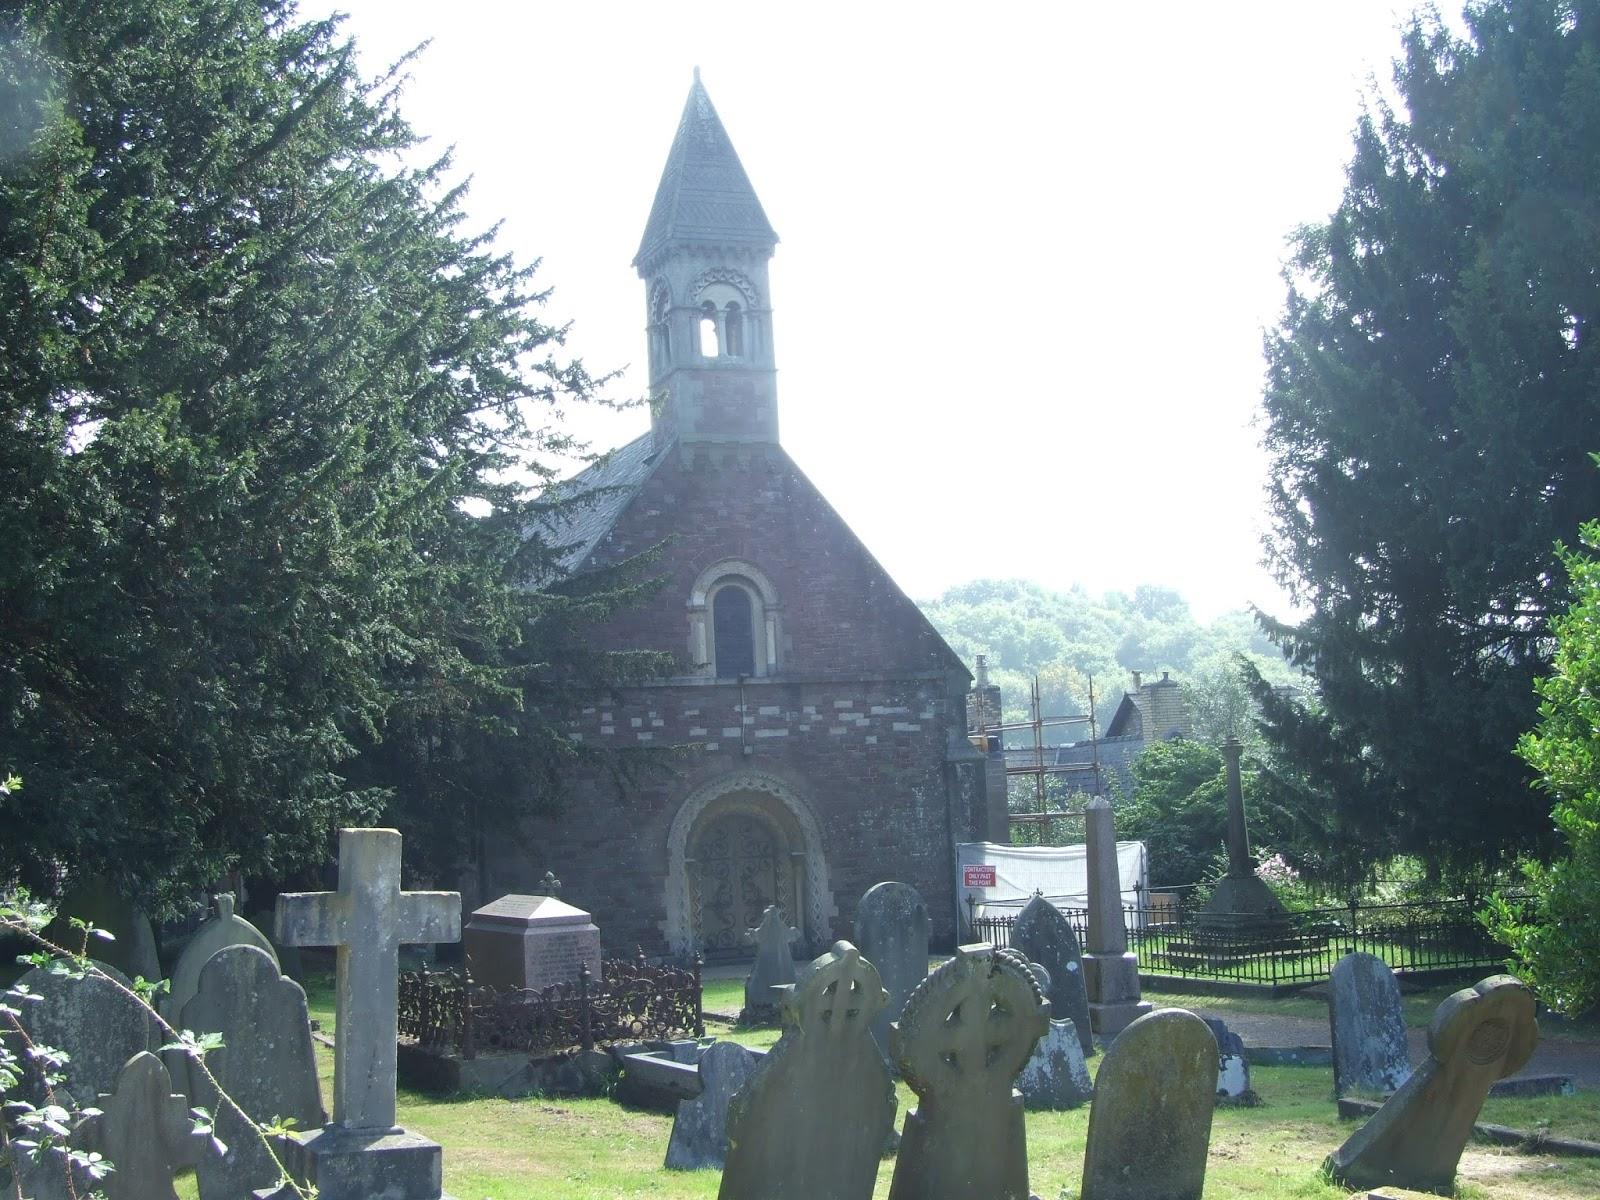 Sofa Malpas Road Newport Sectional No Credit Check Victorian Churches 132 John Prichard St Mary